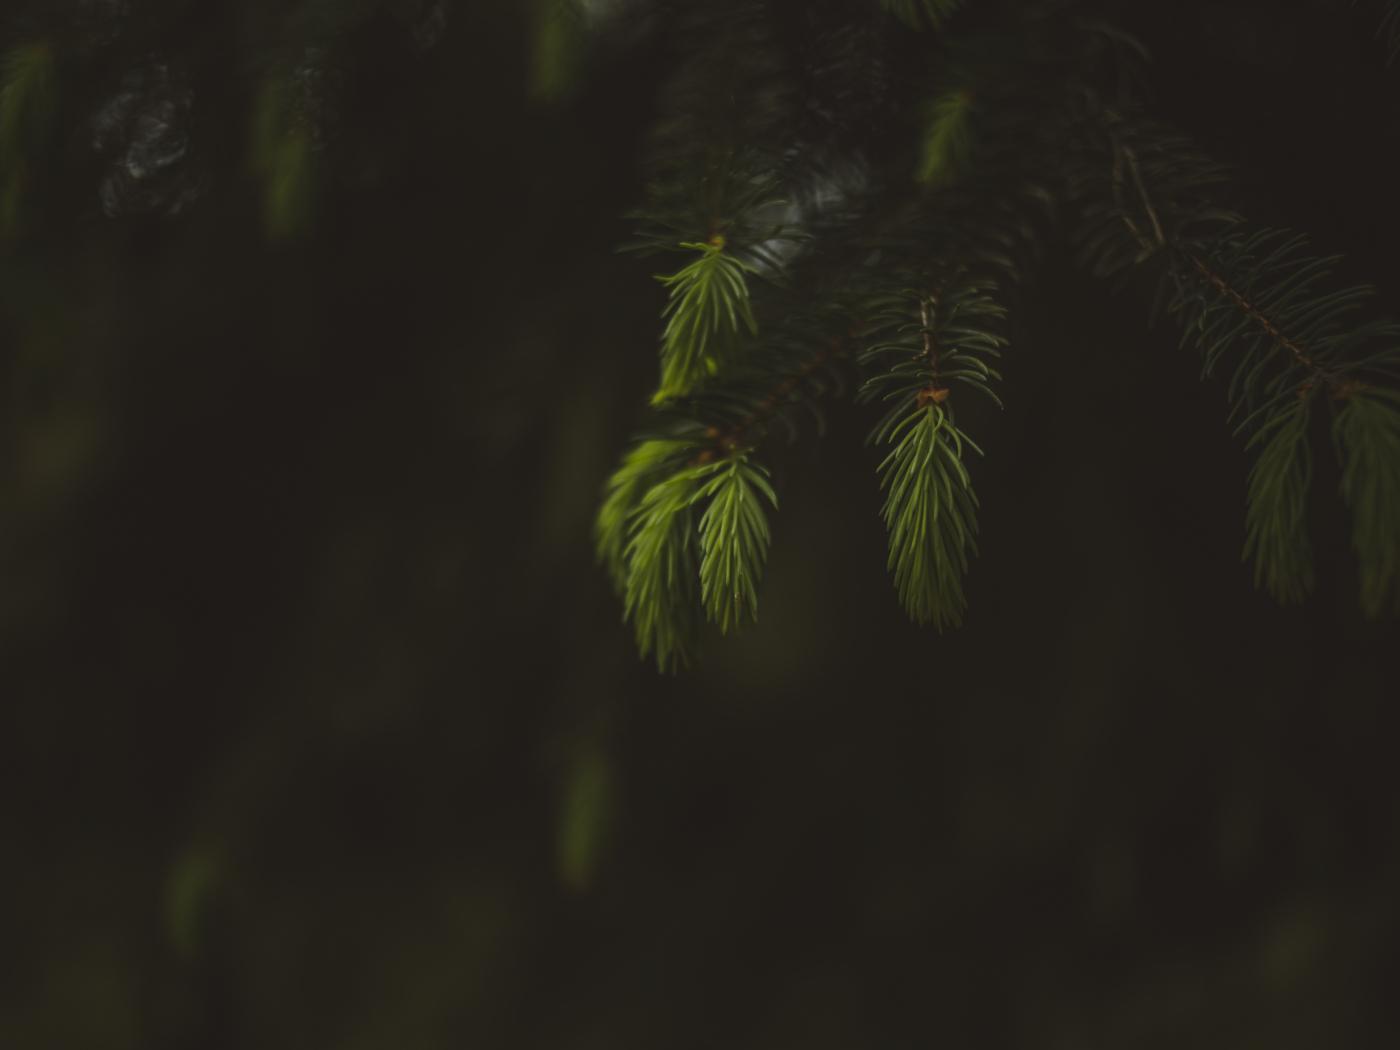 Blur, portrait, leaf, fern, 1400x1050 wallpaper